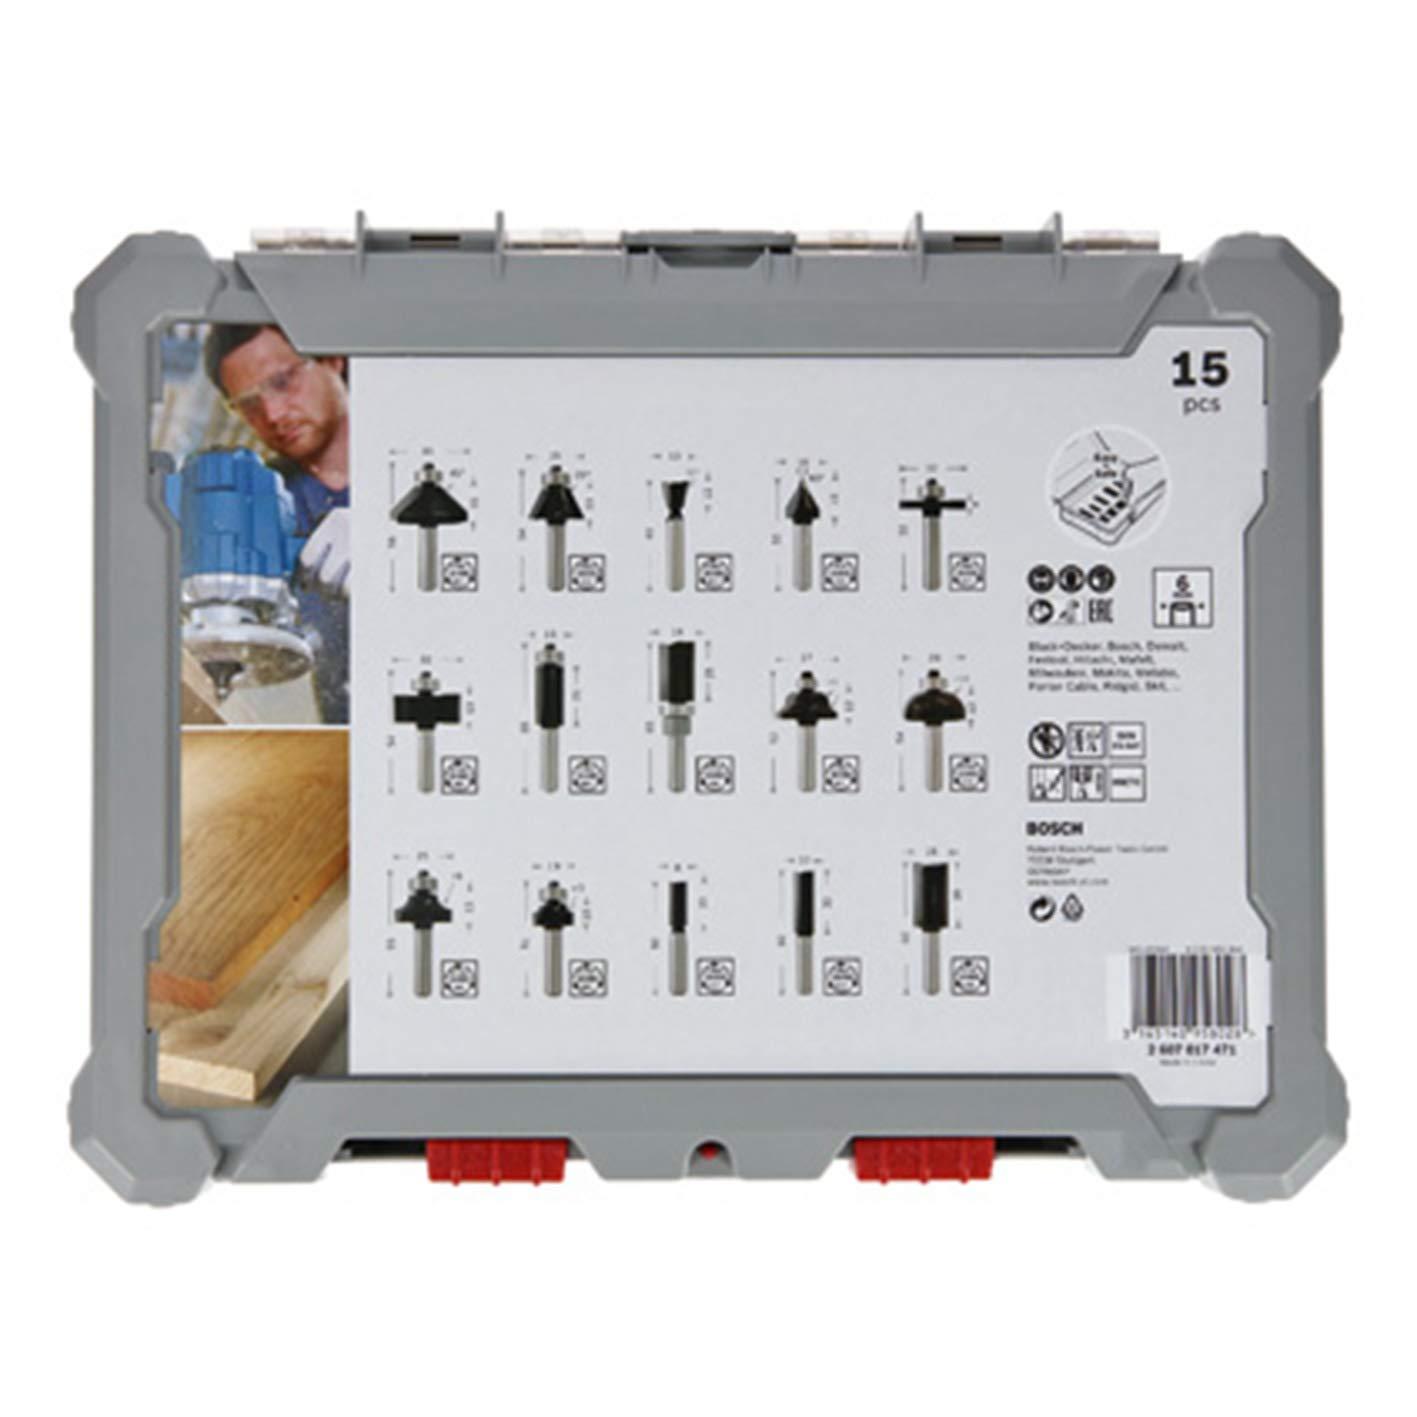 para Madera, para fresadoras con v/ástago de 6 mm Bosch Professional 2607017471 Juego de 15 Fresas